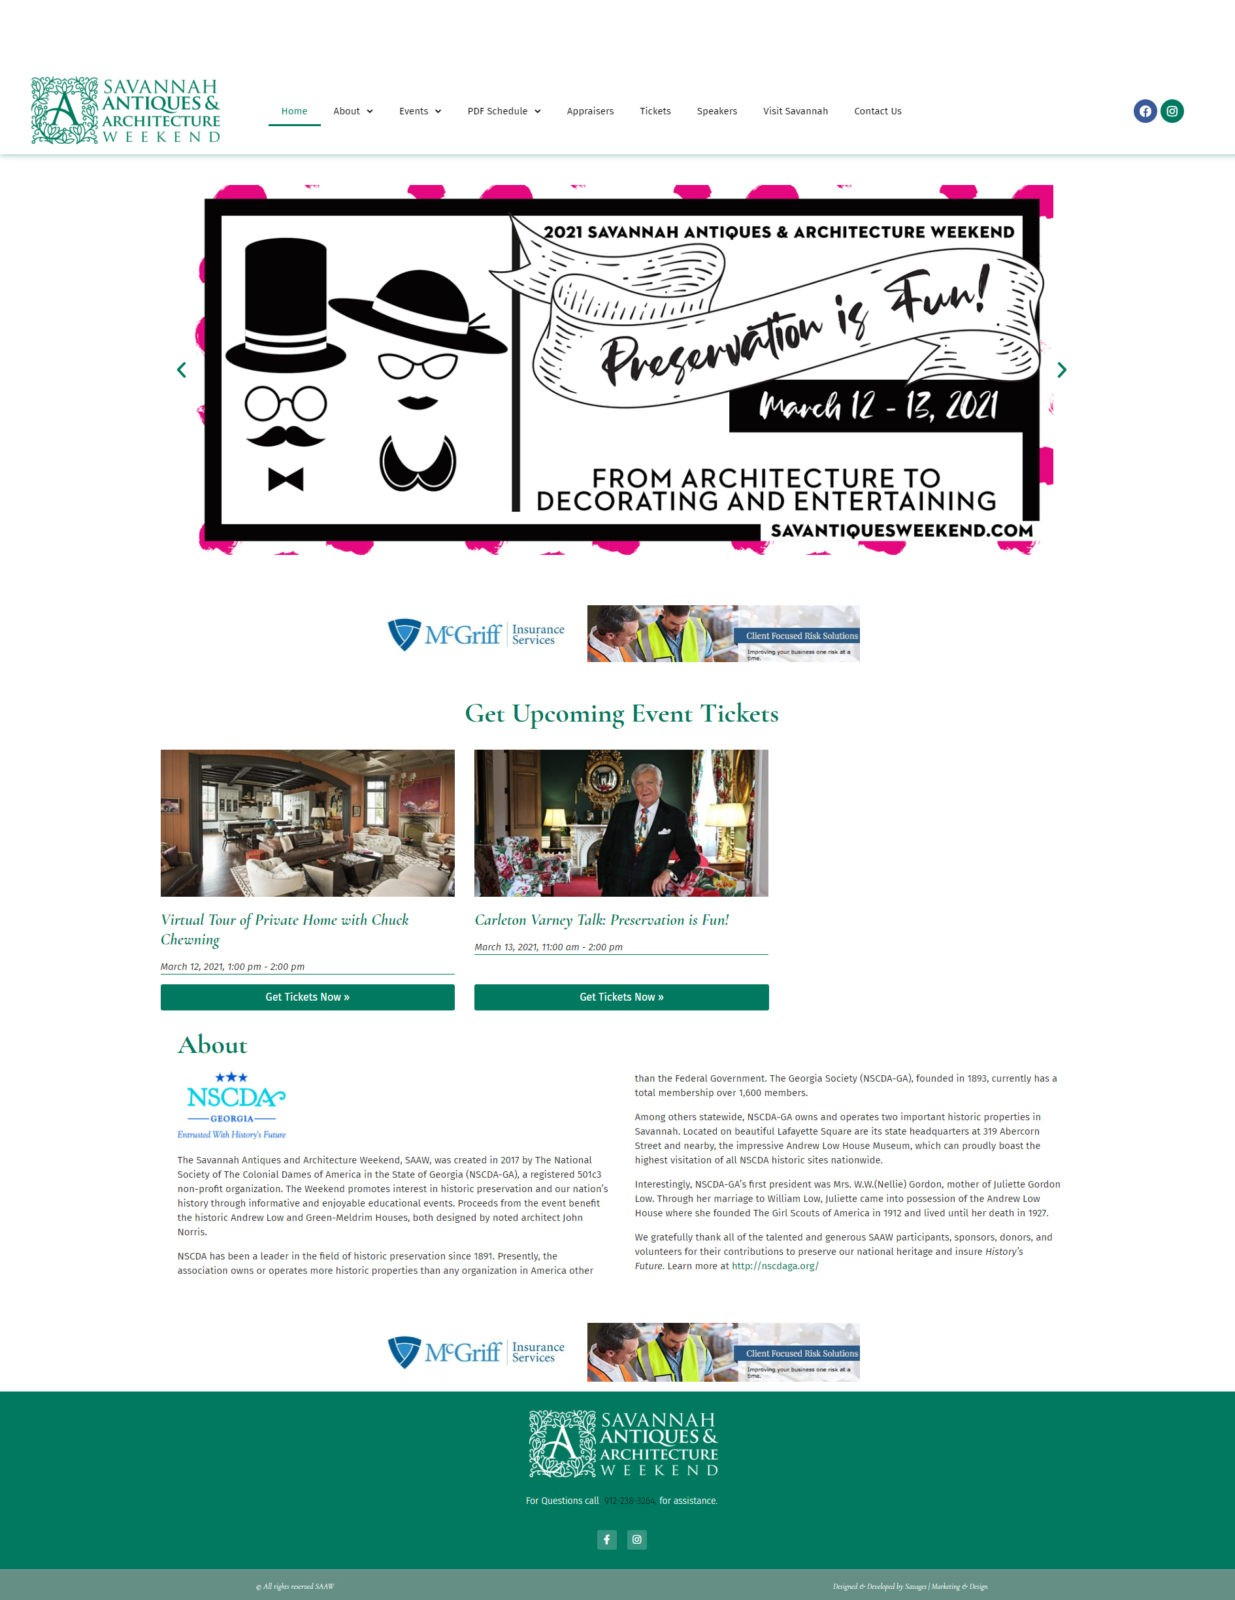 Savannah Antiques & Architecture Weekend Website